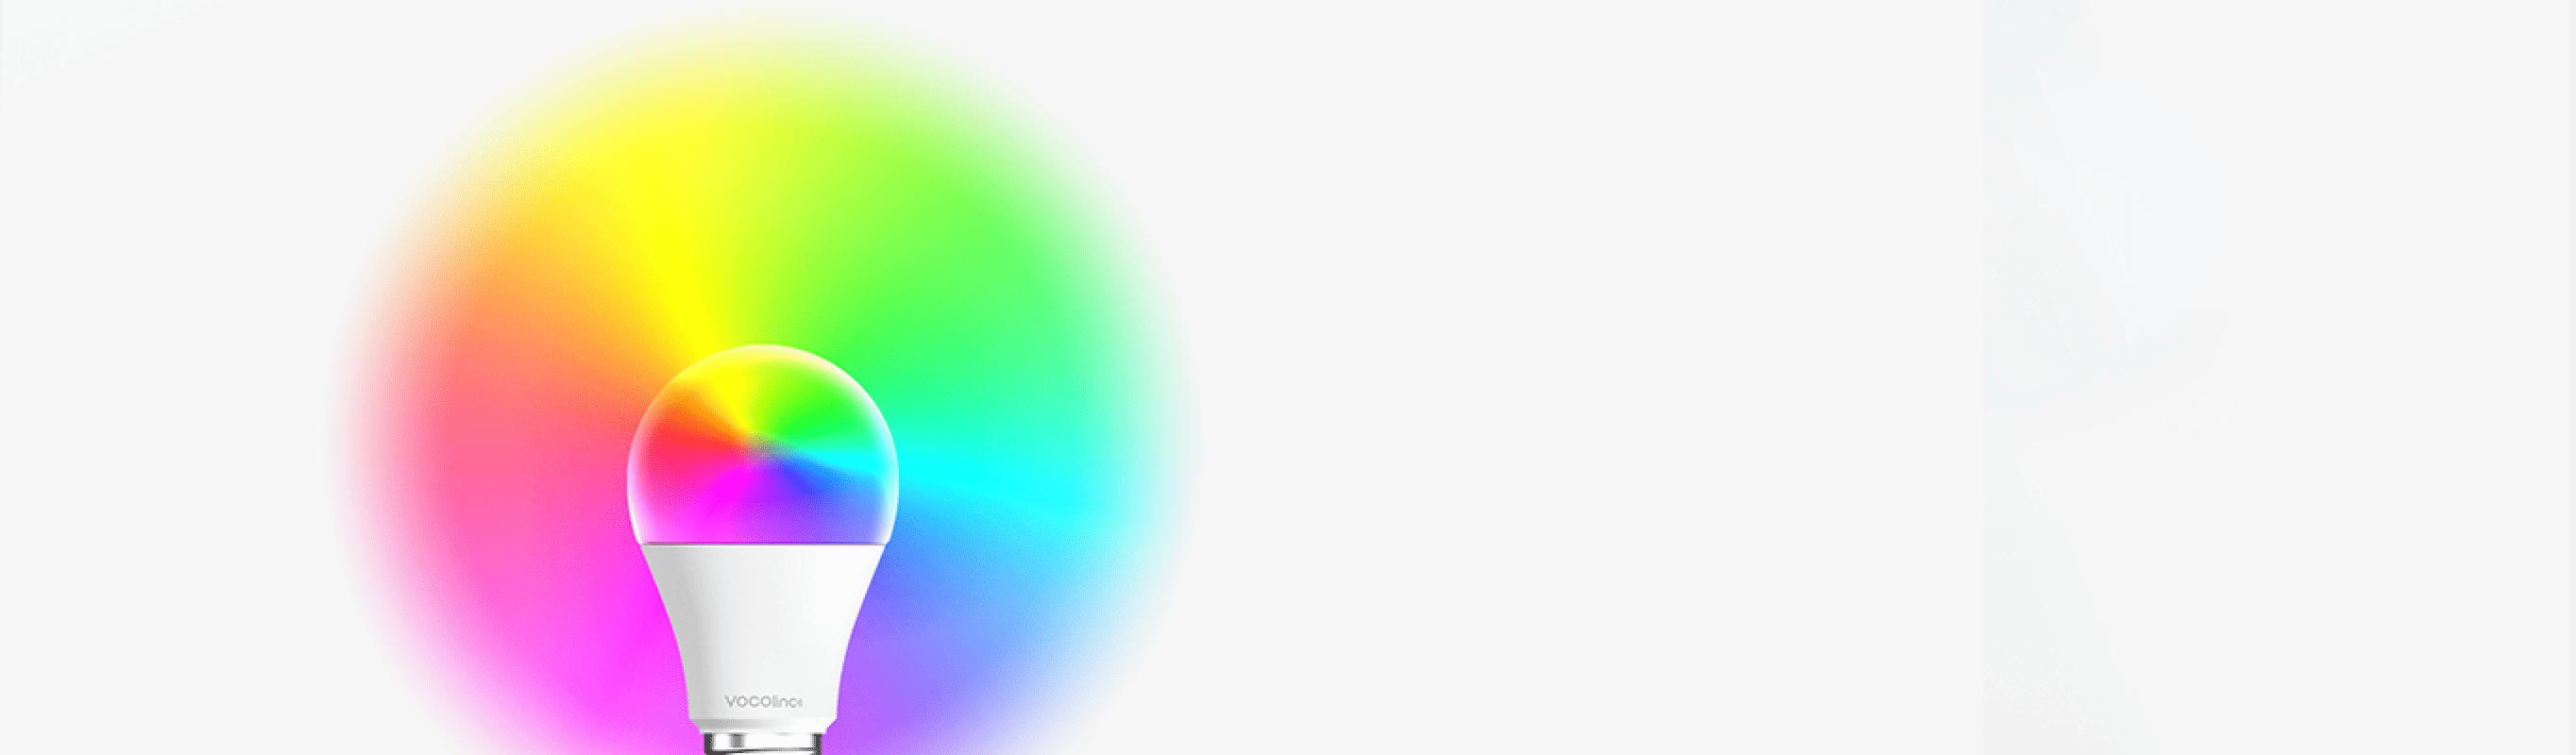 vocolinc-inteligentna-zarowka-led-e27-bitmap-1-33c0879e-decb-4946-8784-4d075ad68600-iShack